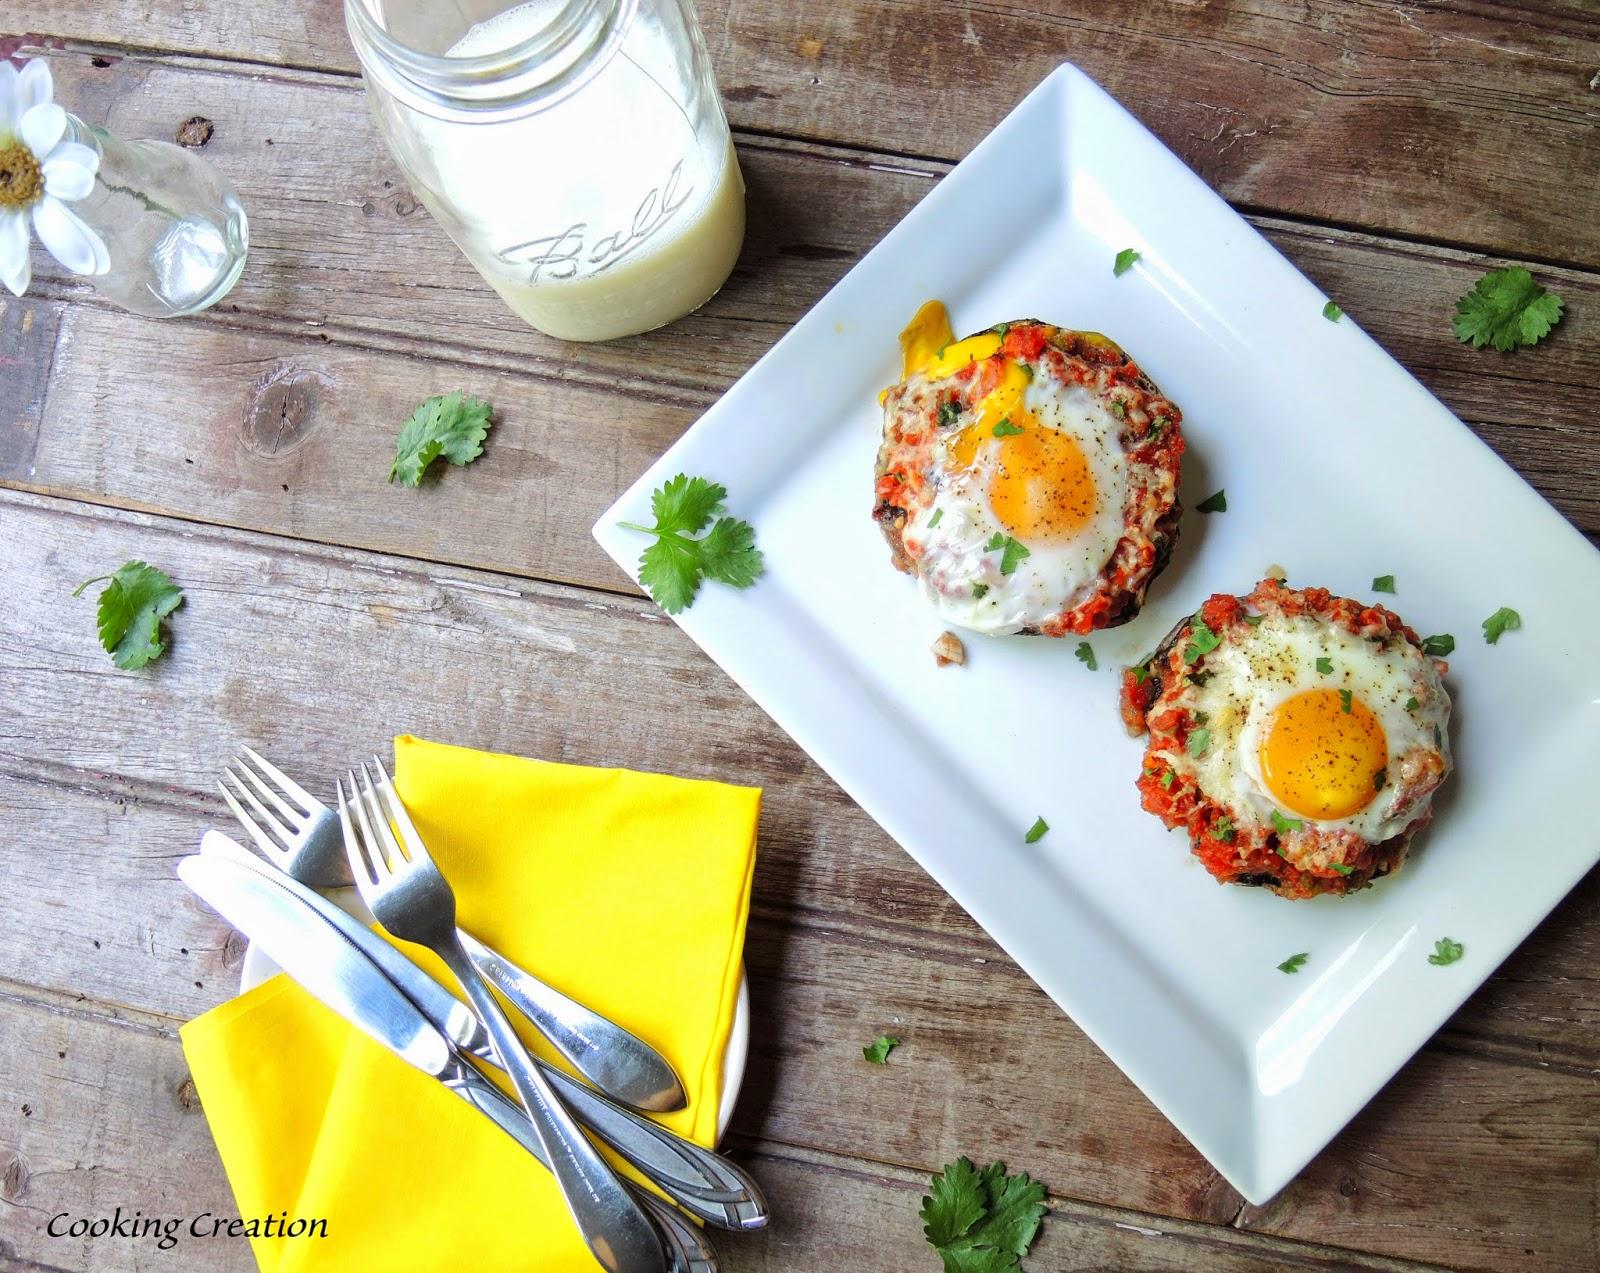 ... Creation: Southwestern Stuffed Portobello Mushrooms for Breakfast